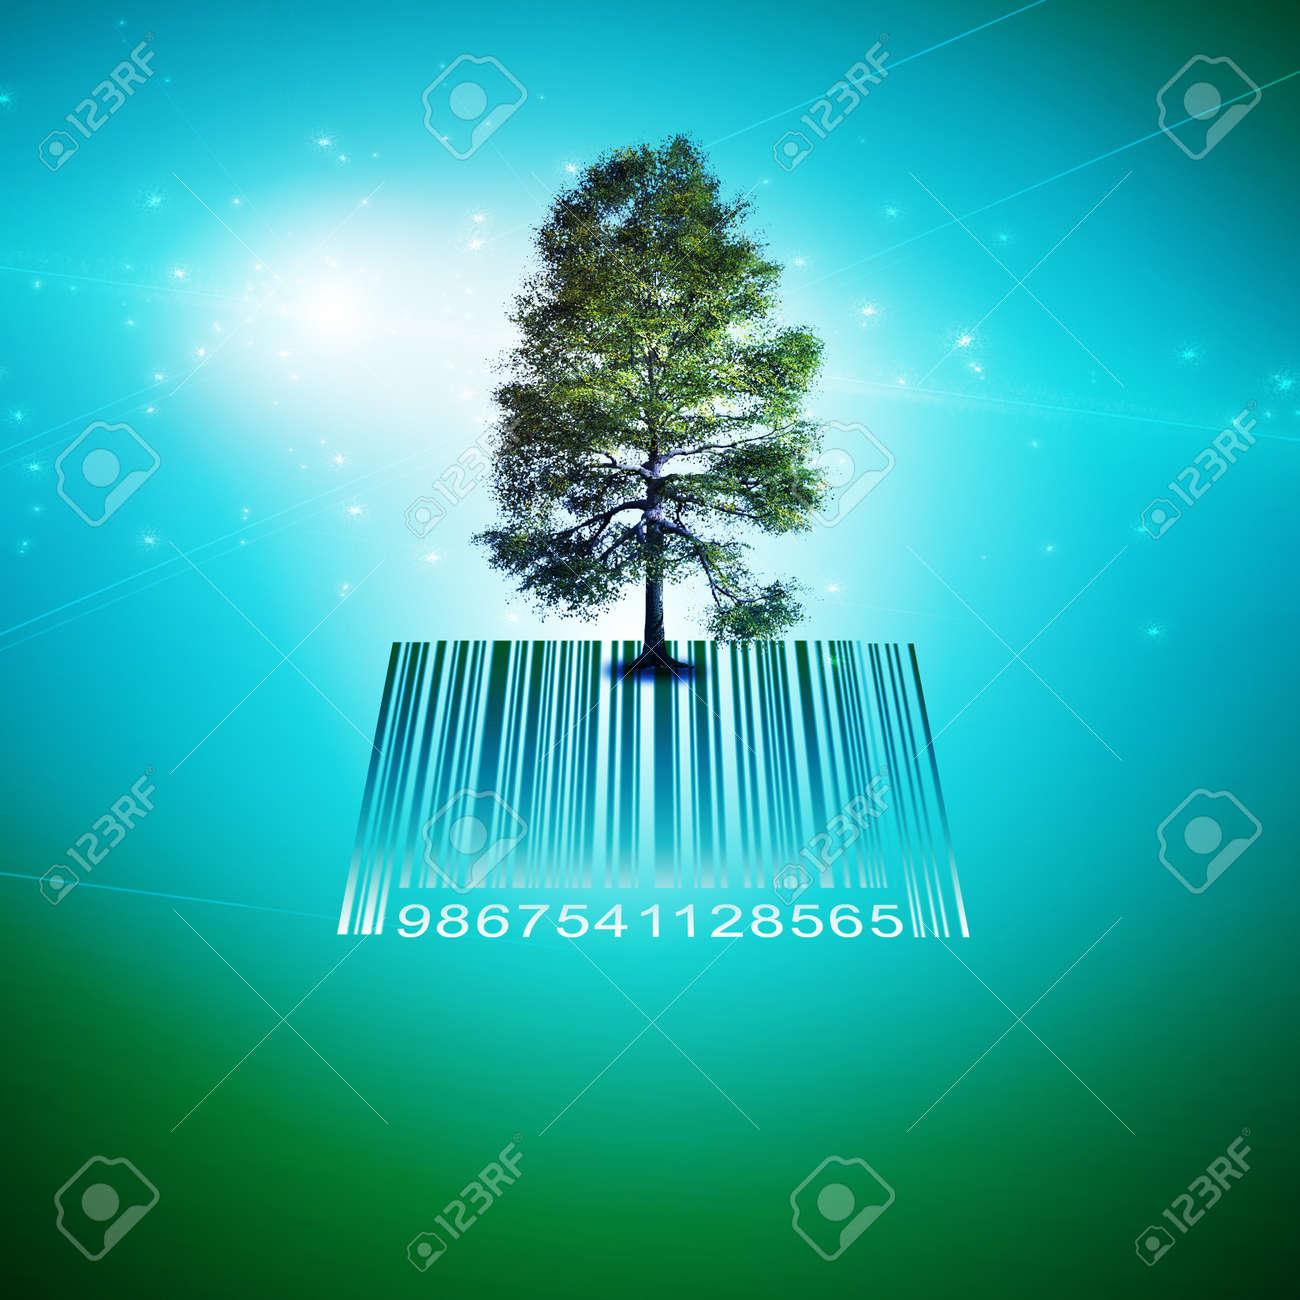 Barcode Tree Stock Photo - 12784487